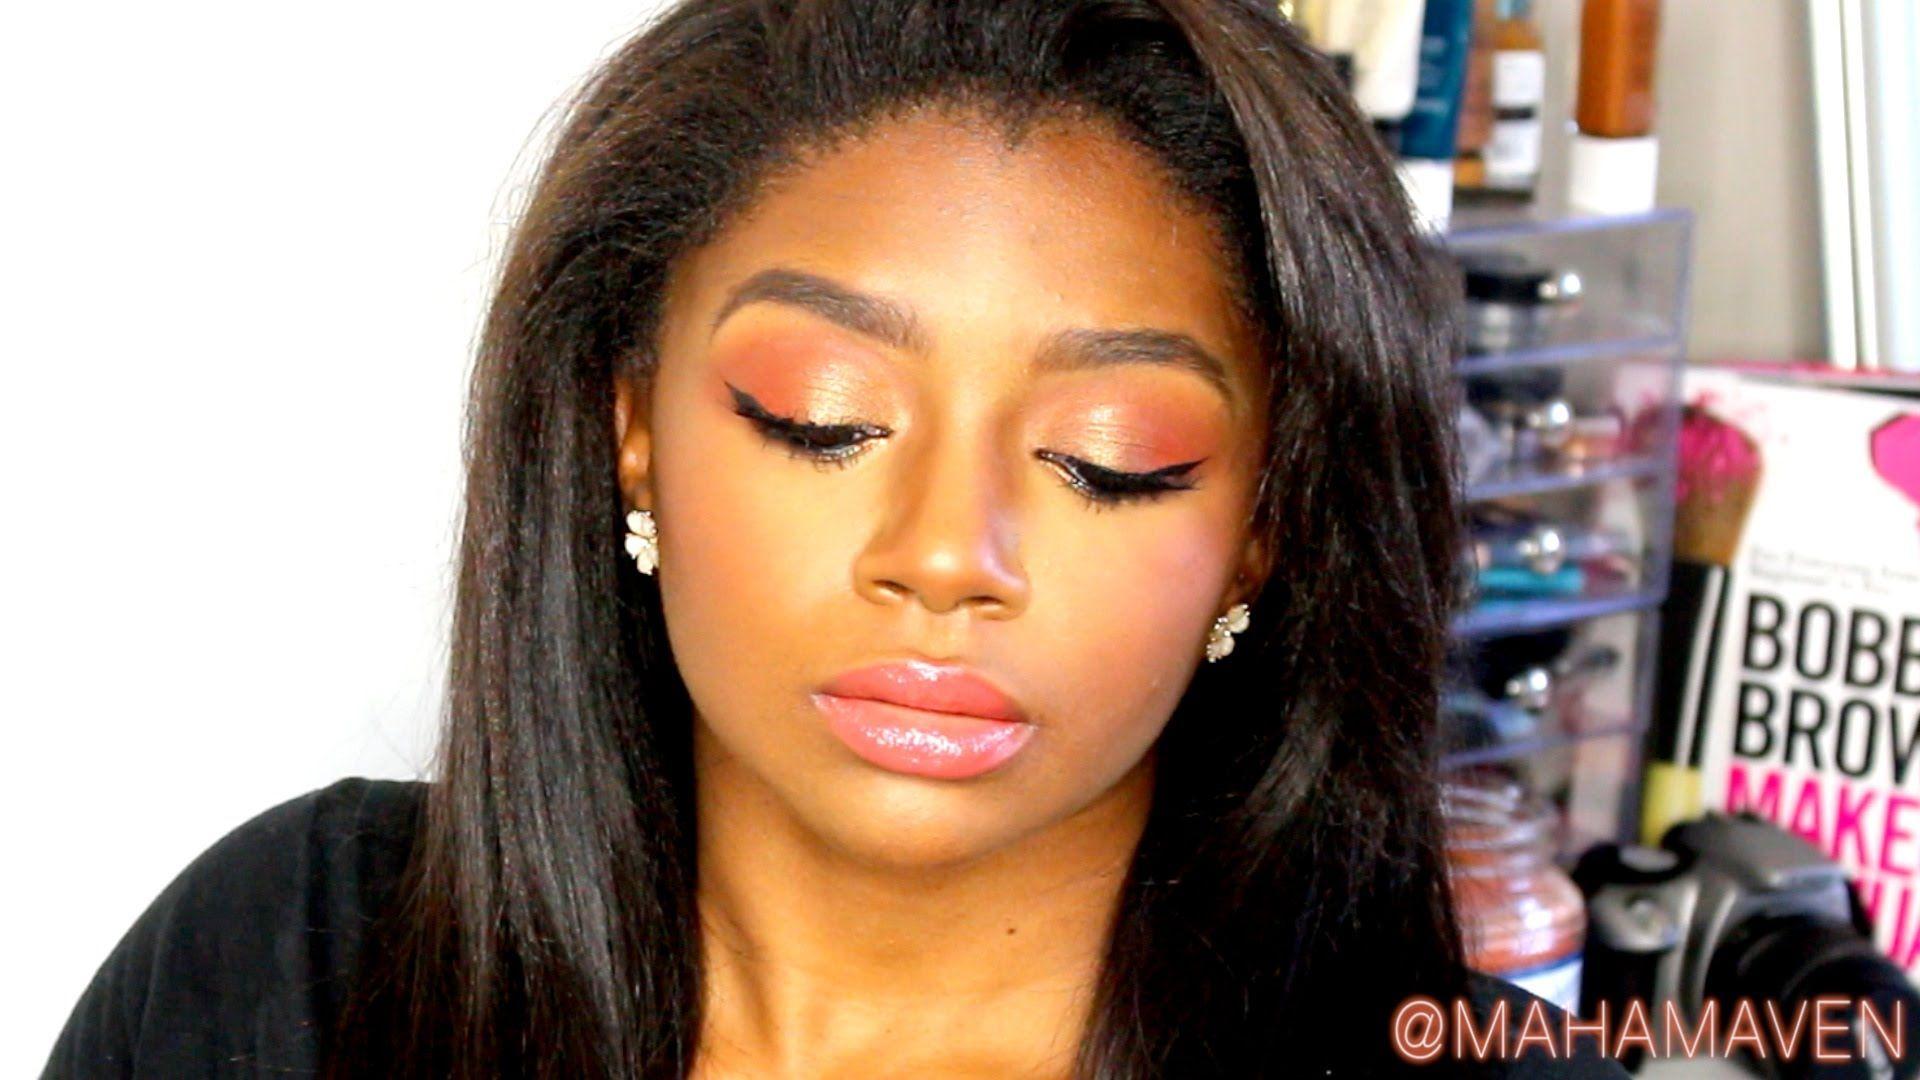 This makeup look was inspired by Nicki Minaj's video